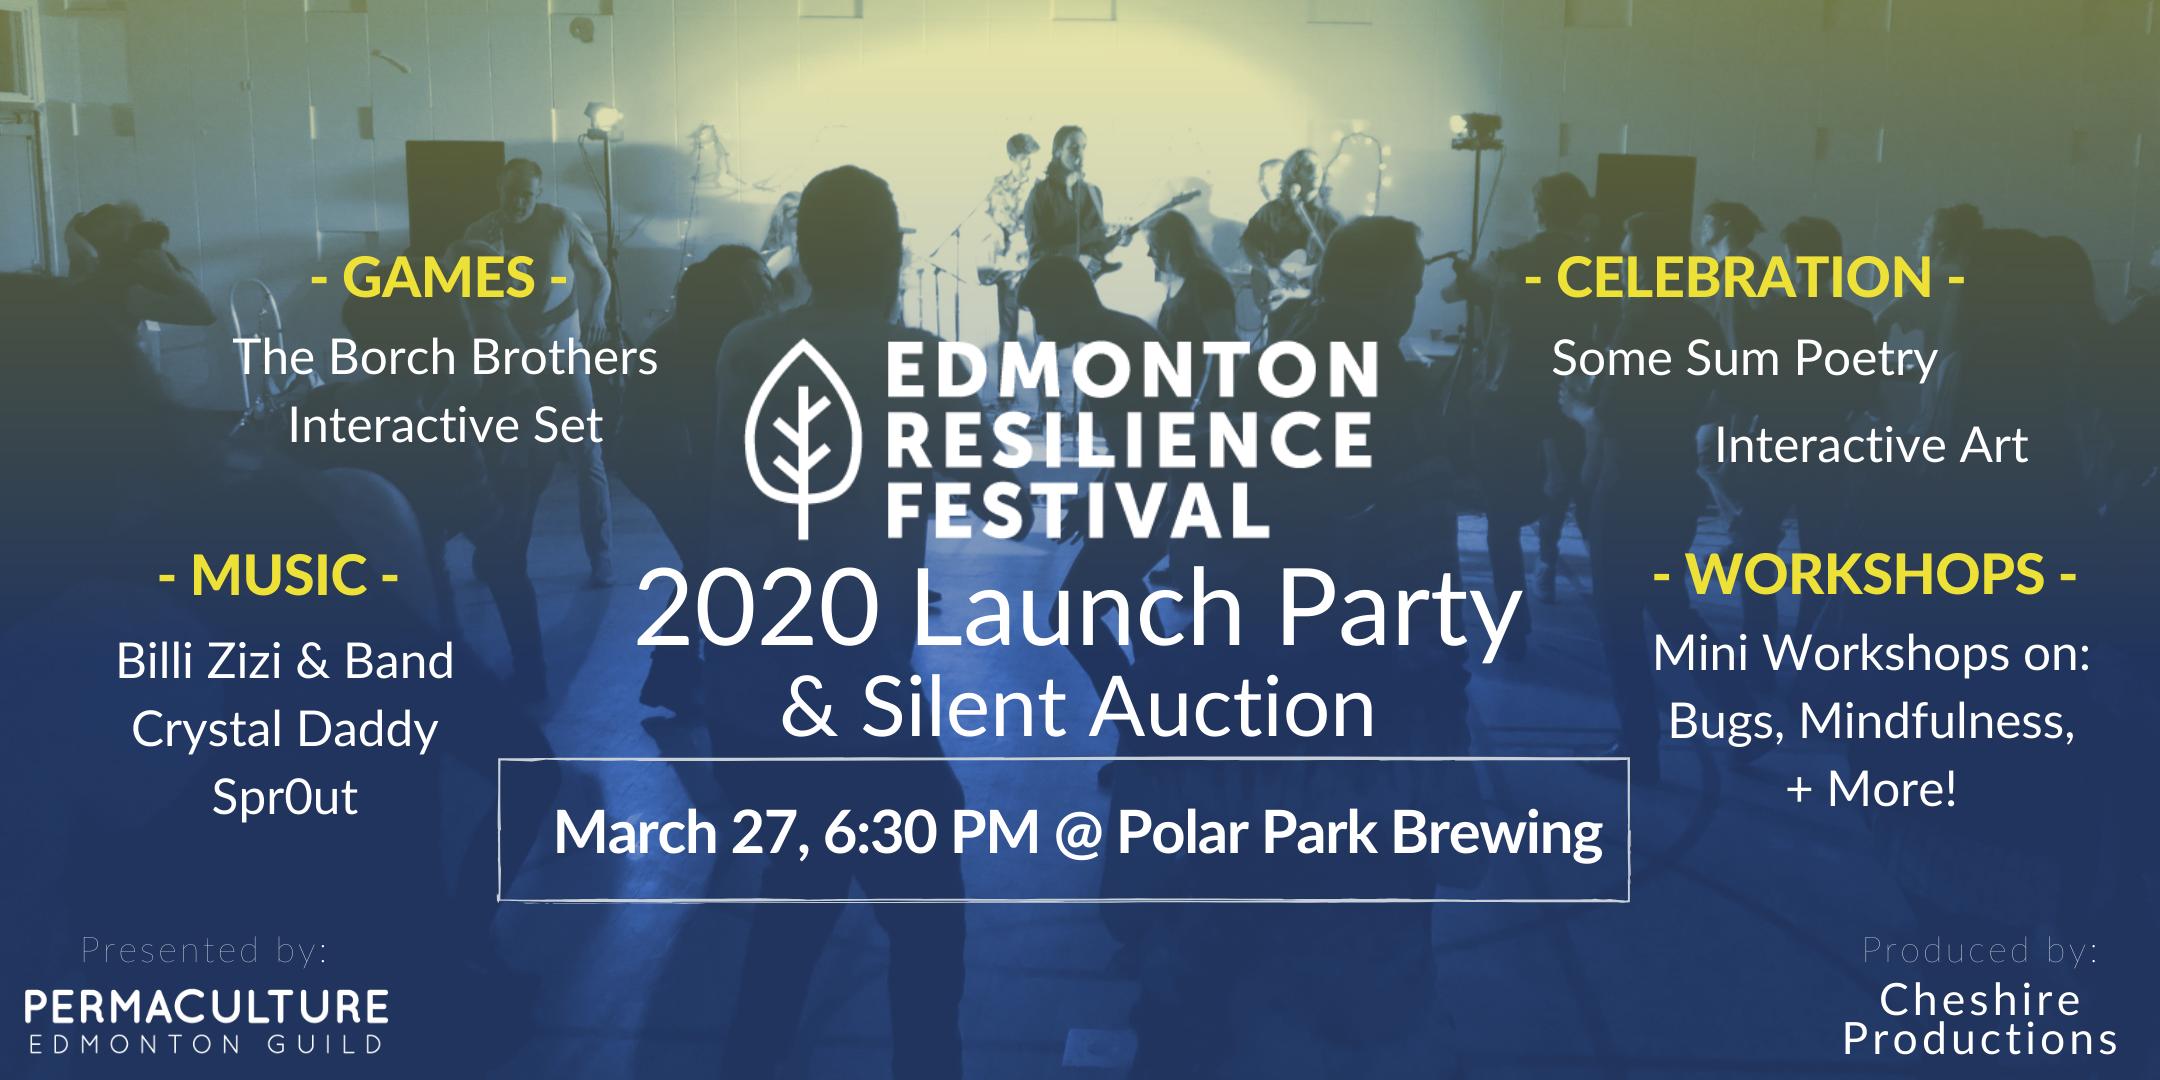 Edmonton Resilience Festival Launch Party 2020